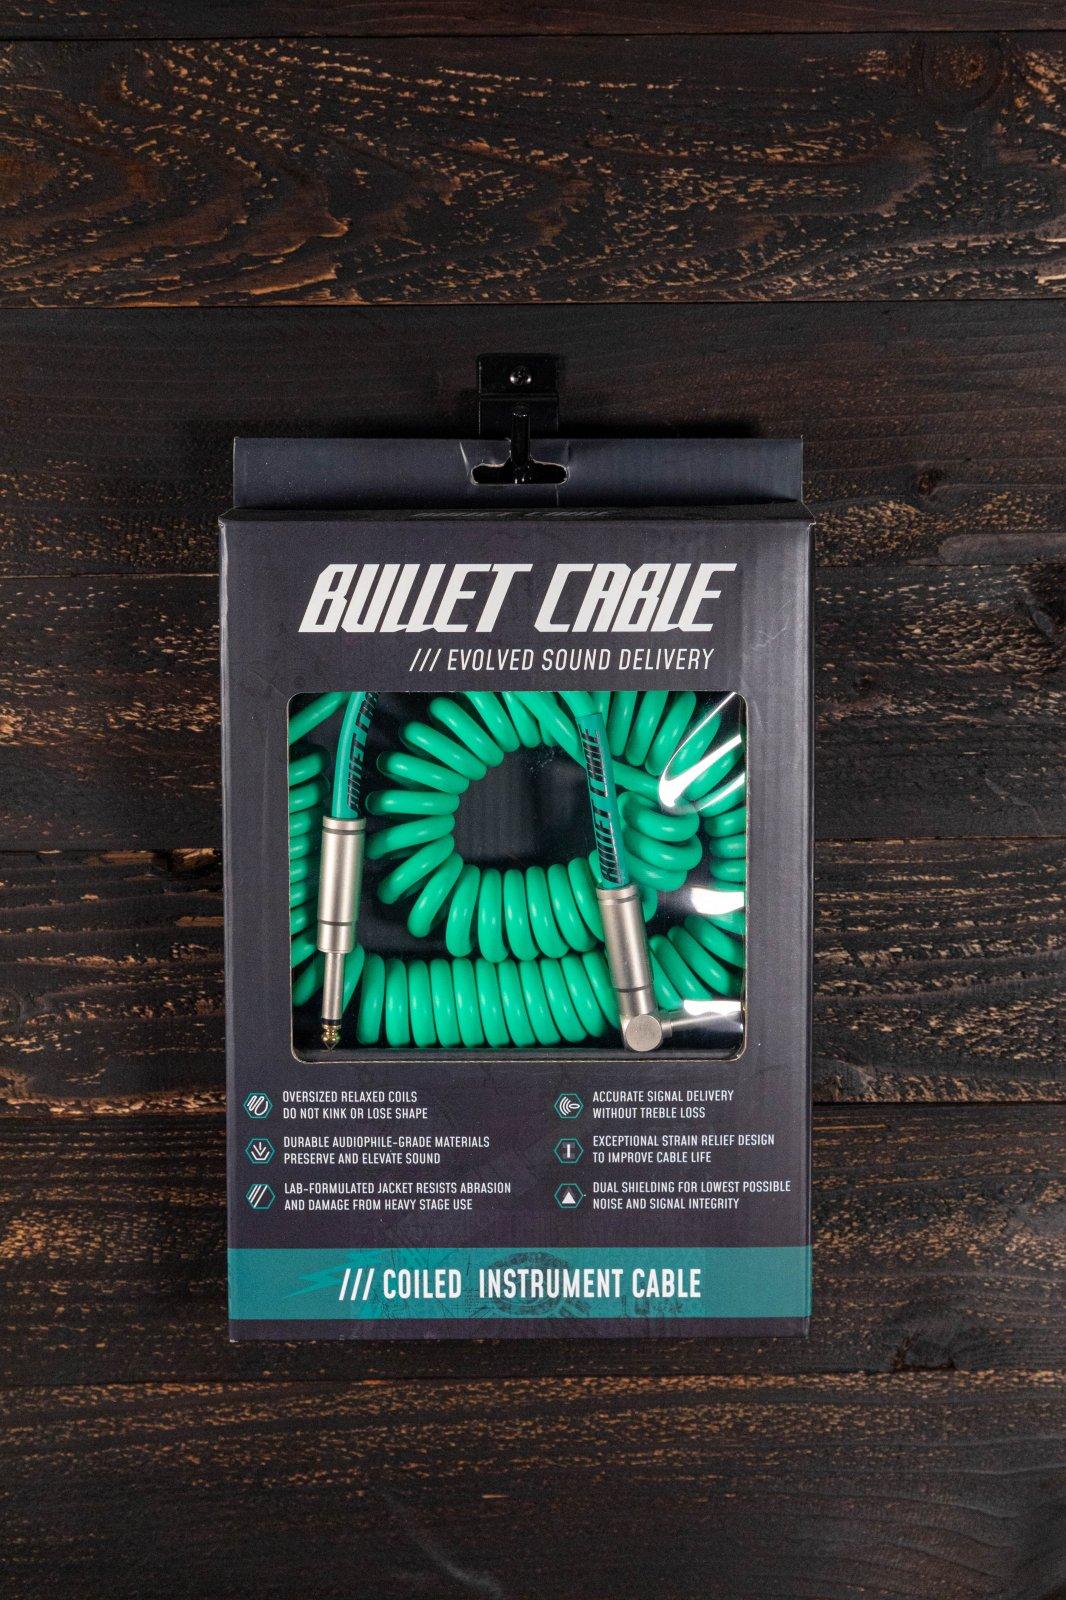 Bullet Cable 15' Coil Cable - Seafoam